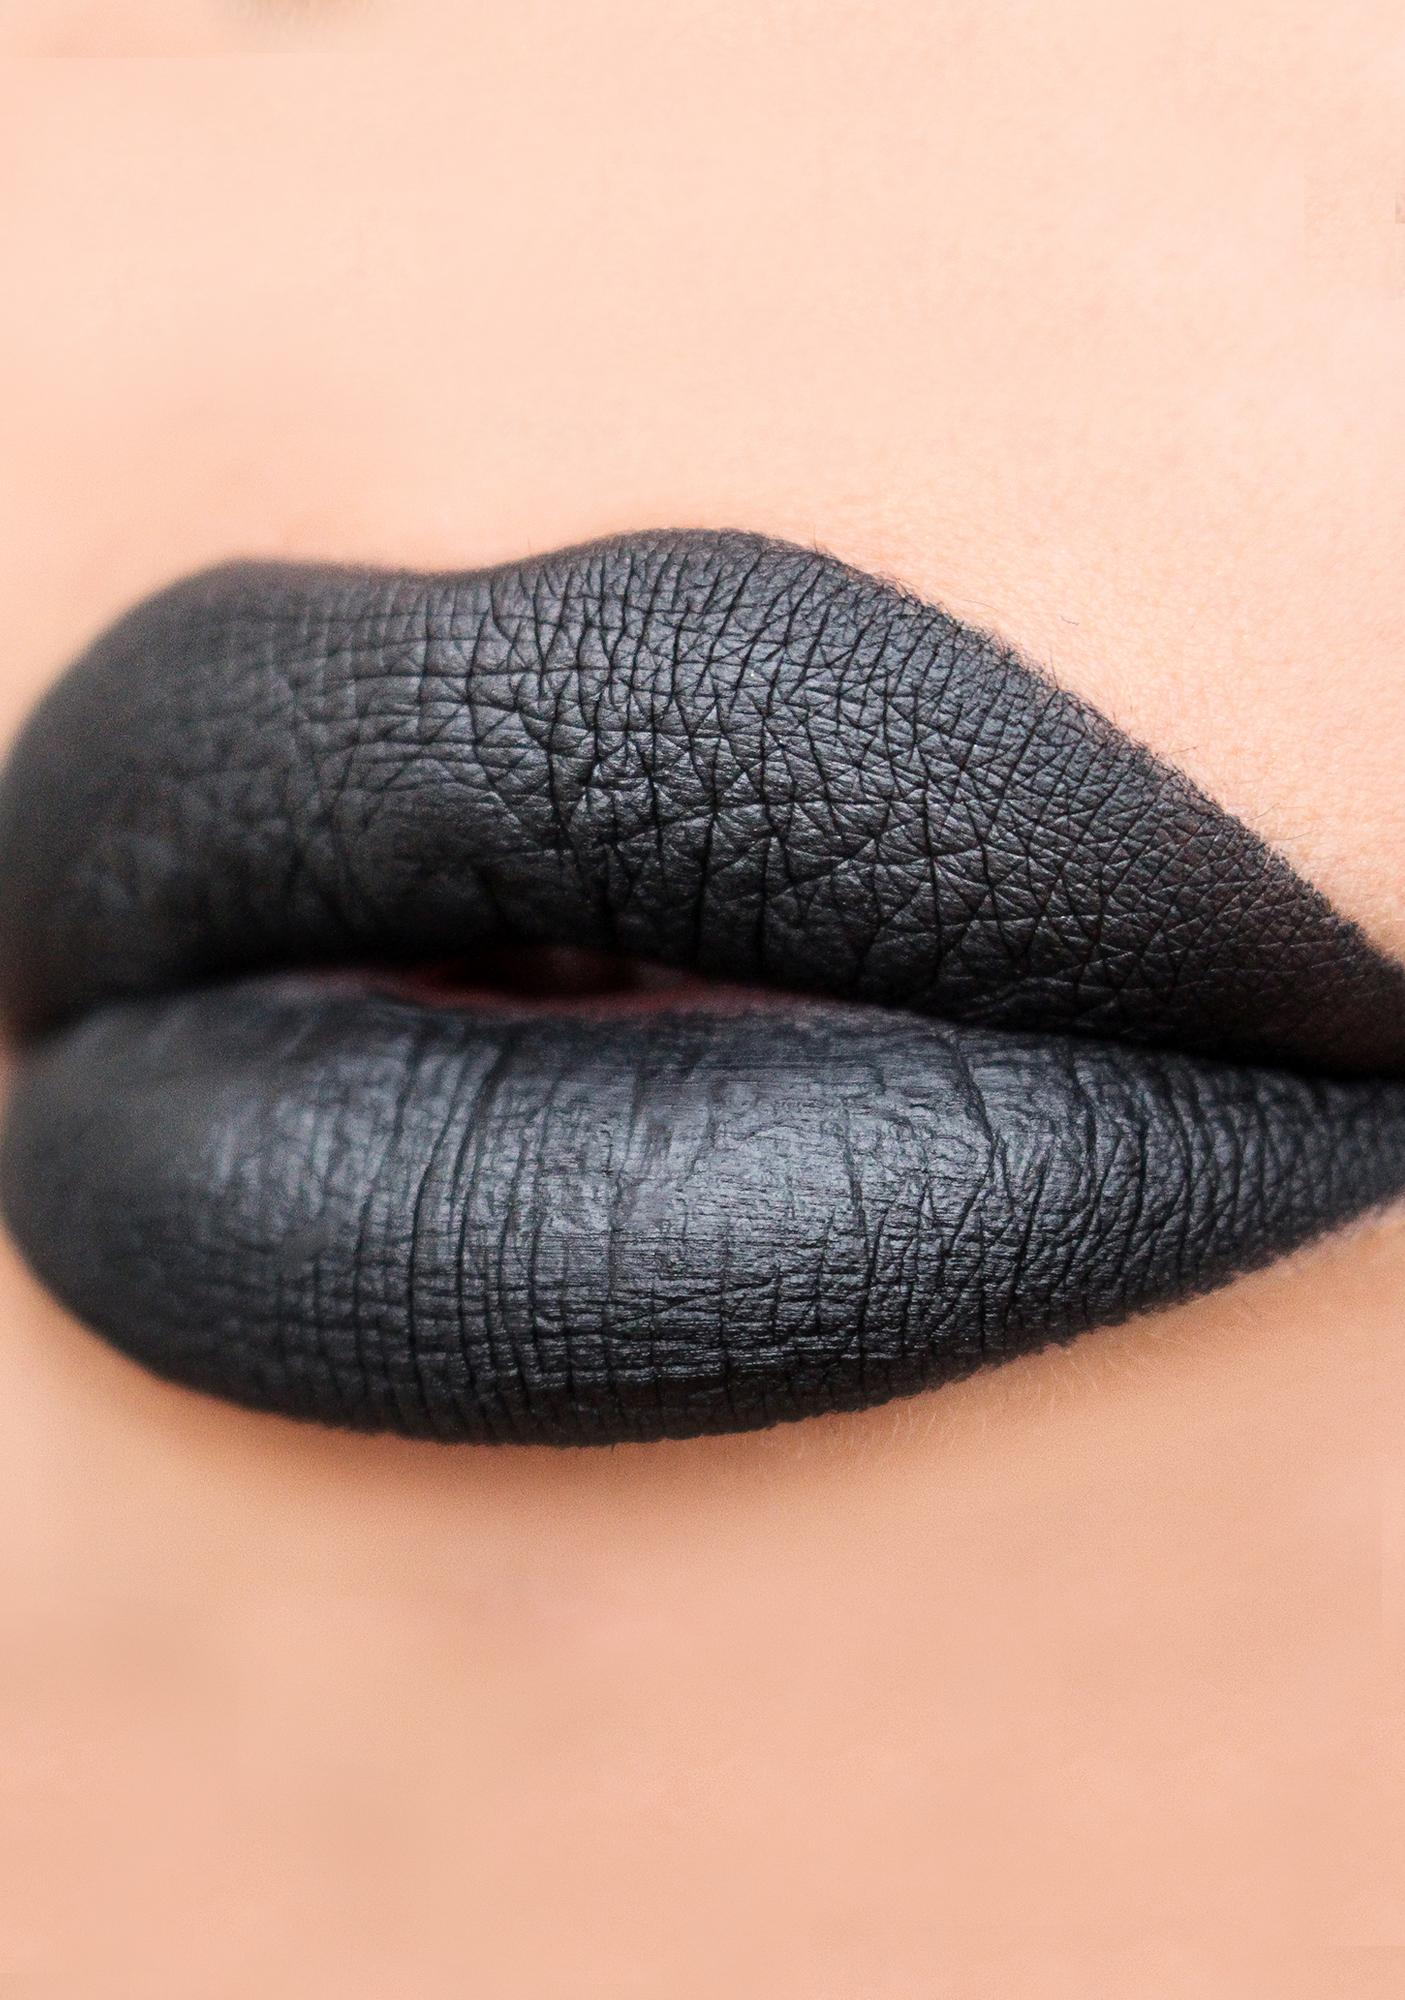 Atomic Makeup Xray CBD- Infused Liquid Lipstick